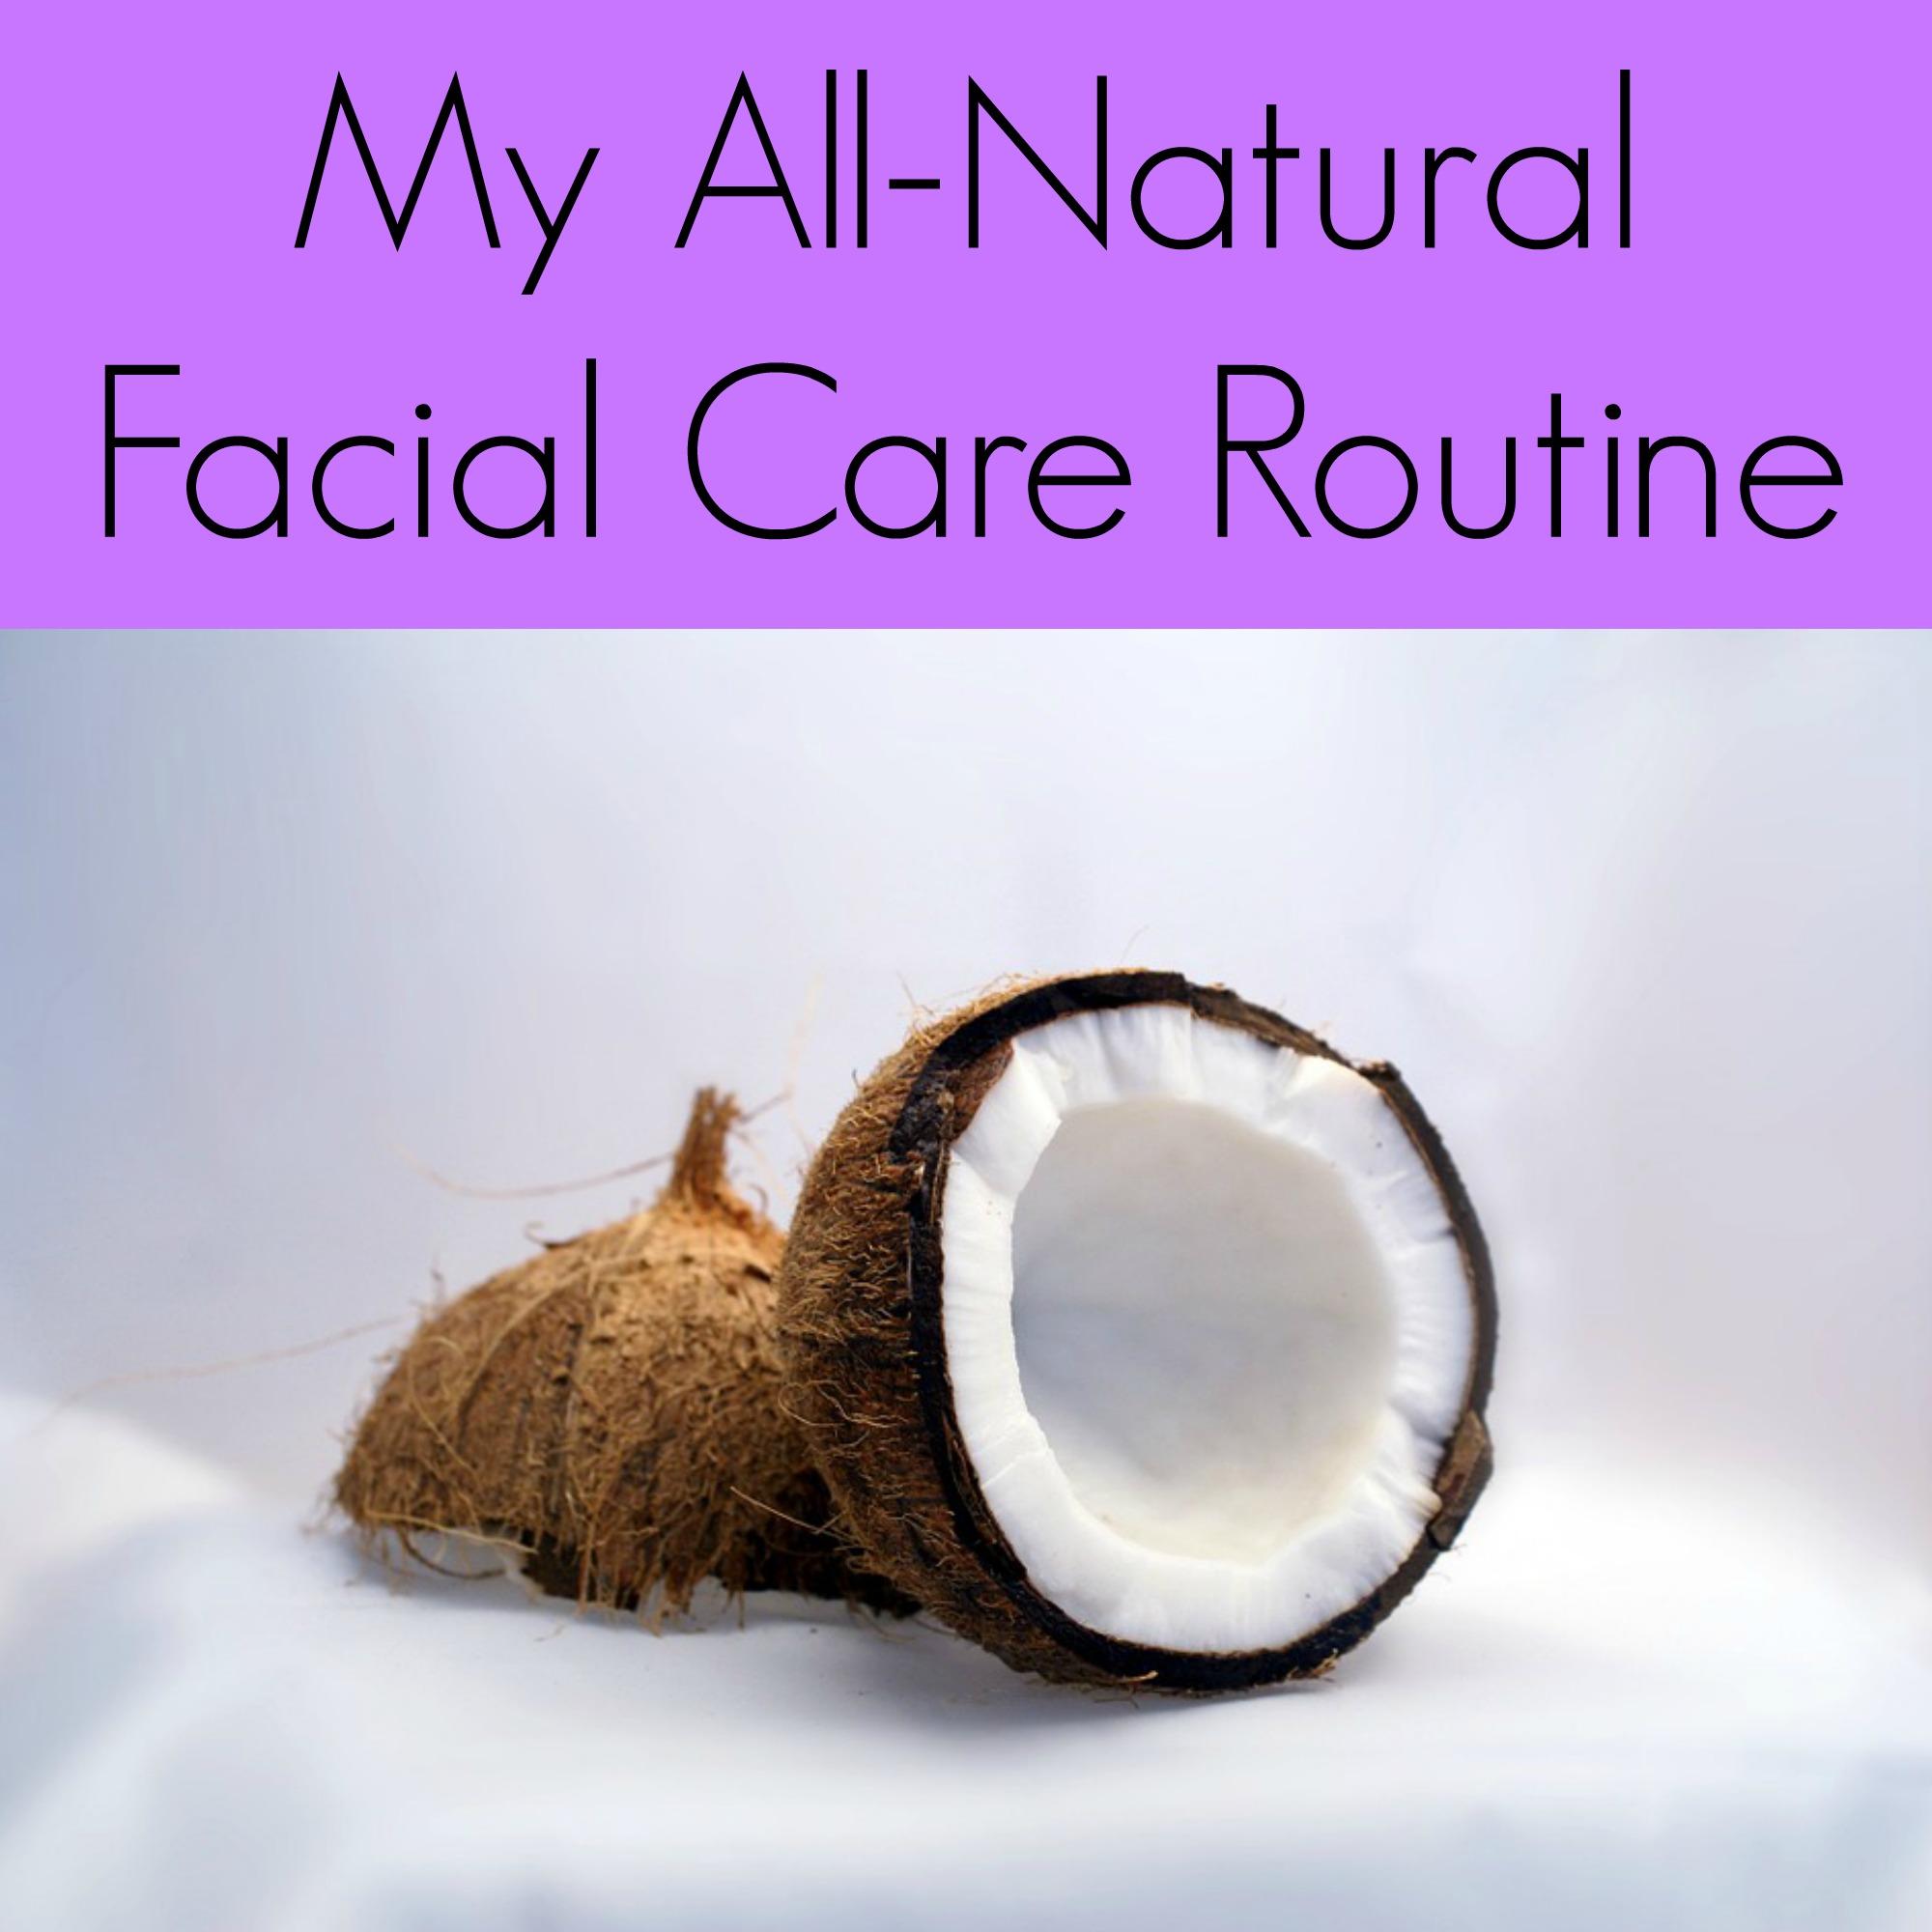 All Natural Facial Care